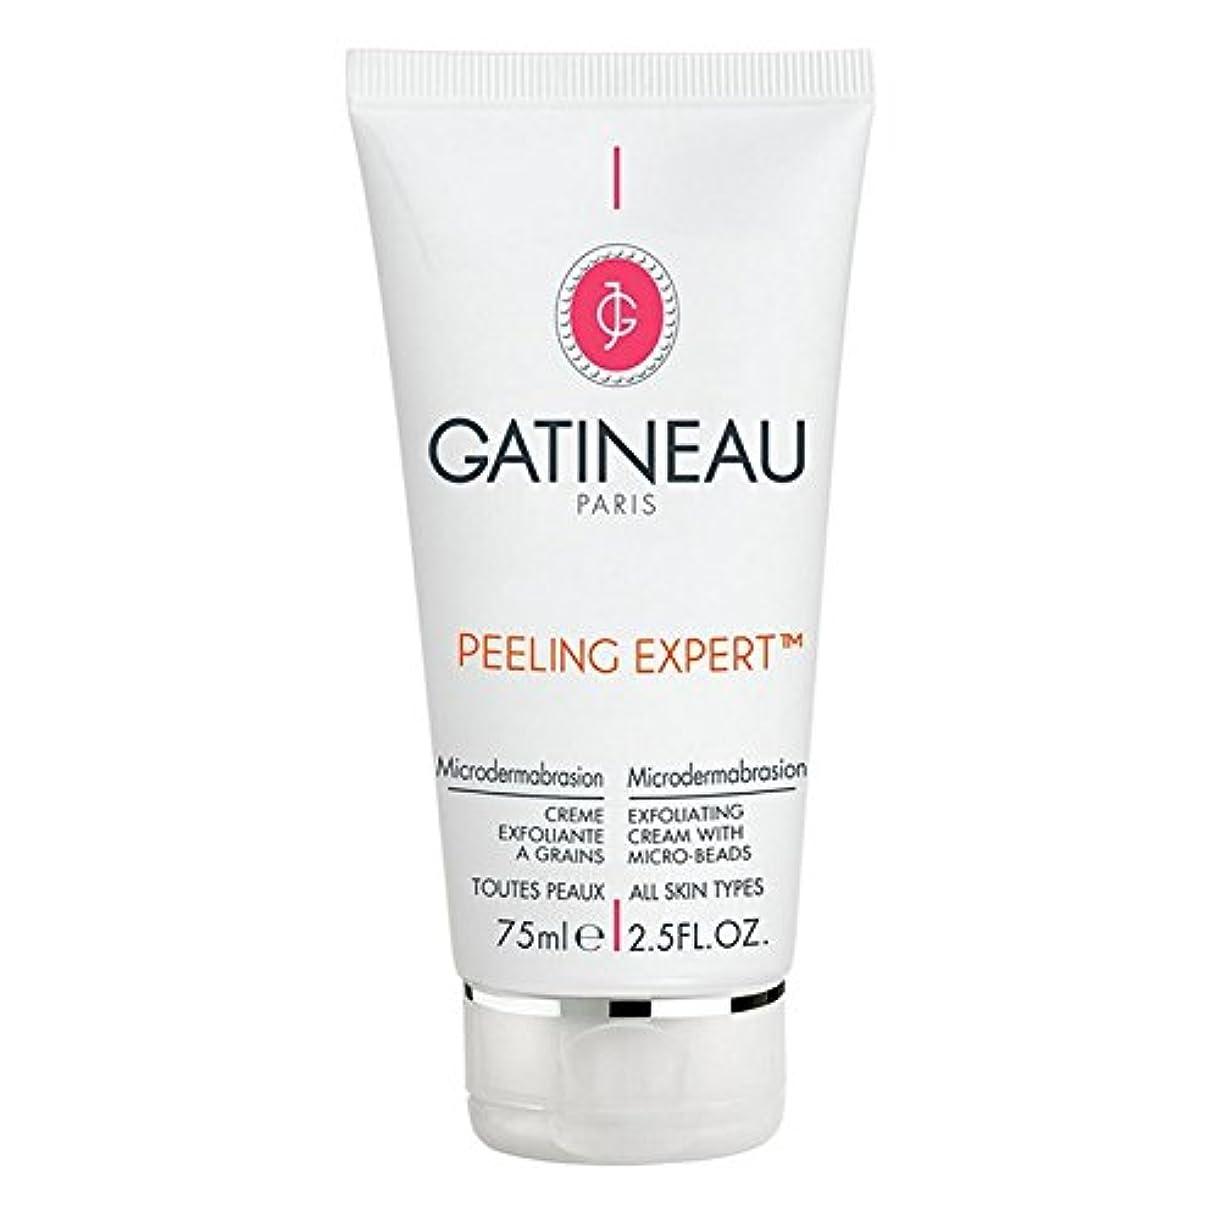 Gatineau Pro-Radiance Microdermabrasion Cream 75ml - ガティノープロ輝きマイクロダーマブレーションクリーム75ミリリットル [並行輸入品]